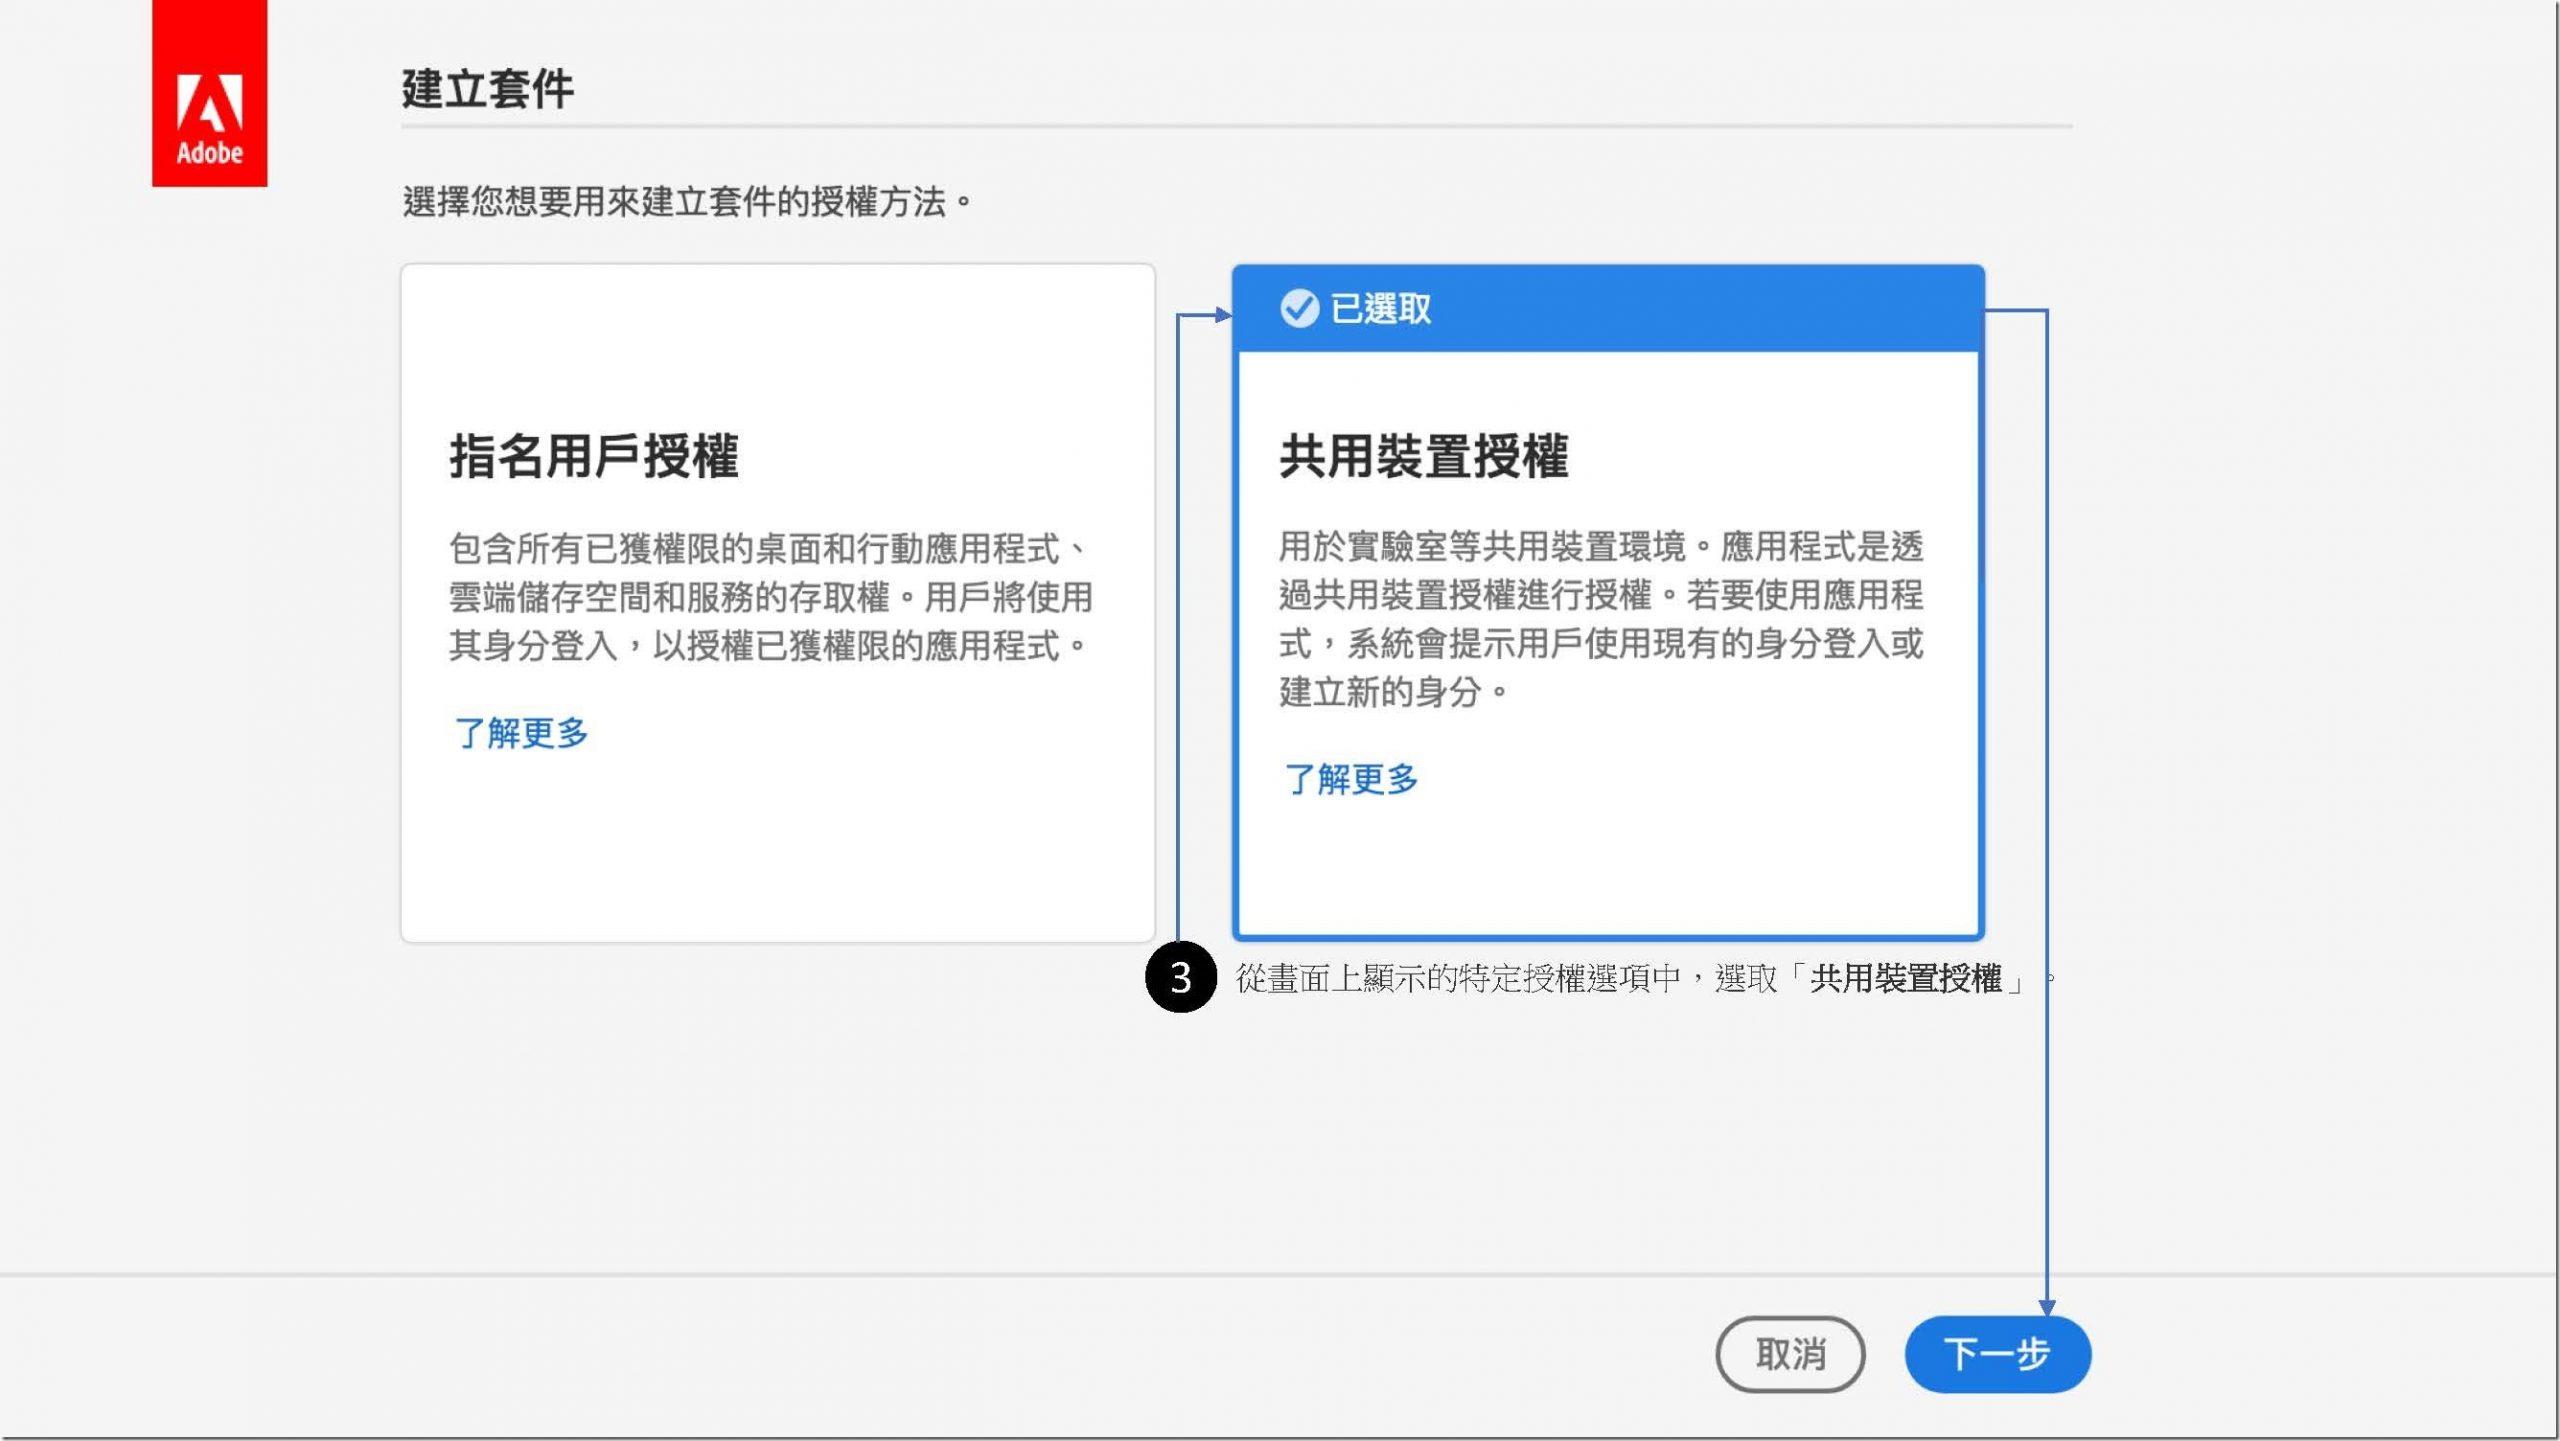 Adobe 共用裝置授權安裝指南_教育通用_頁面_14